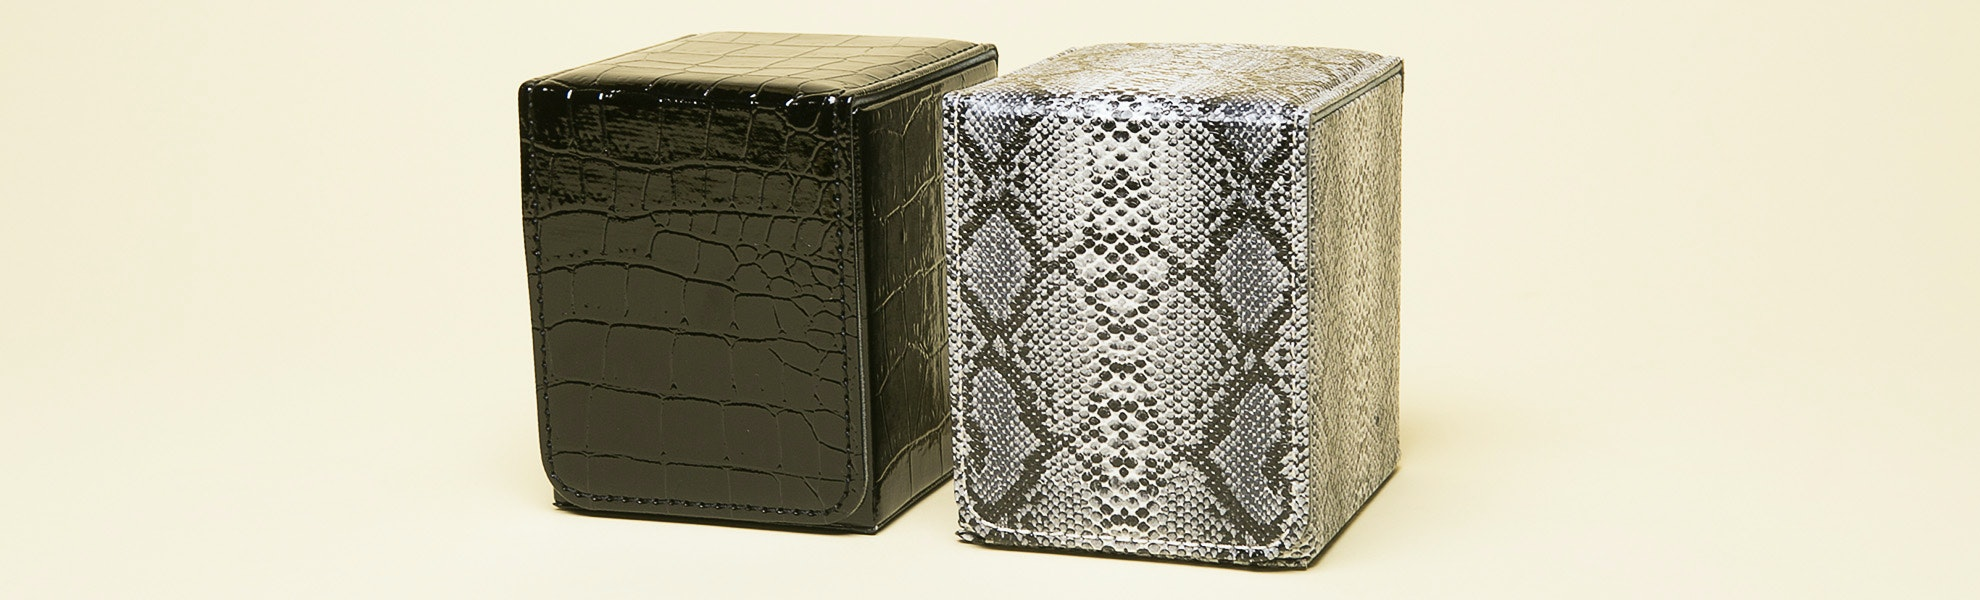 Dex Protection Small Safari Deck Box (2-Pack)